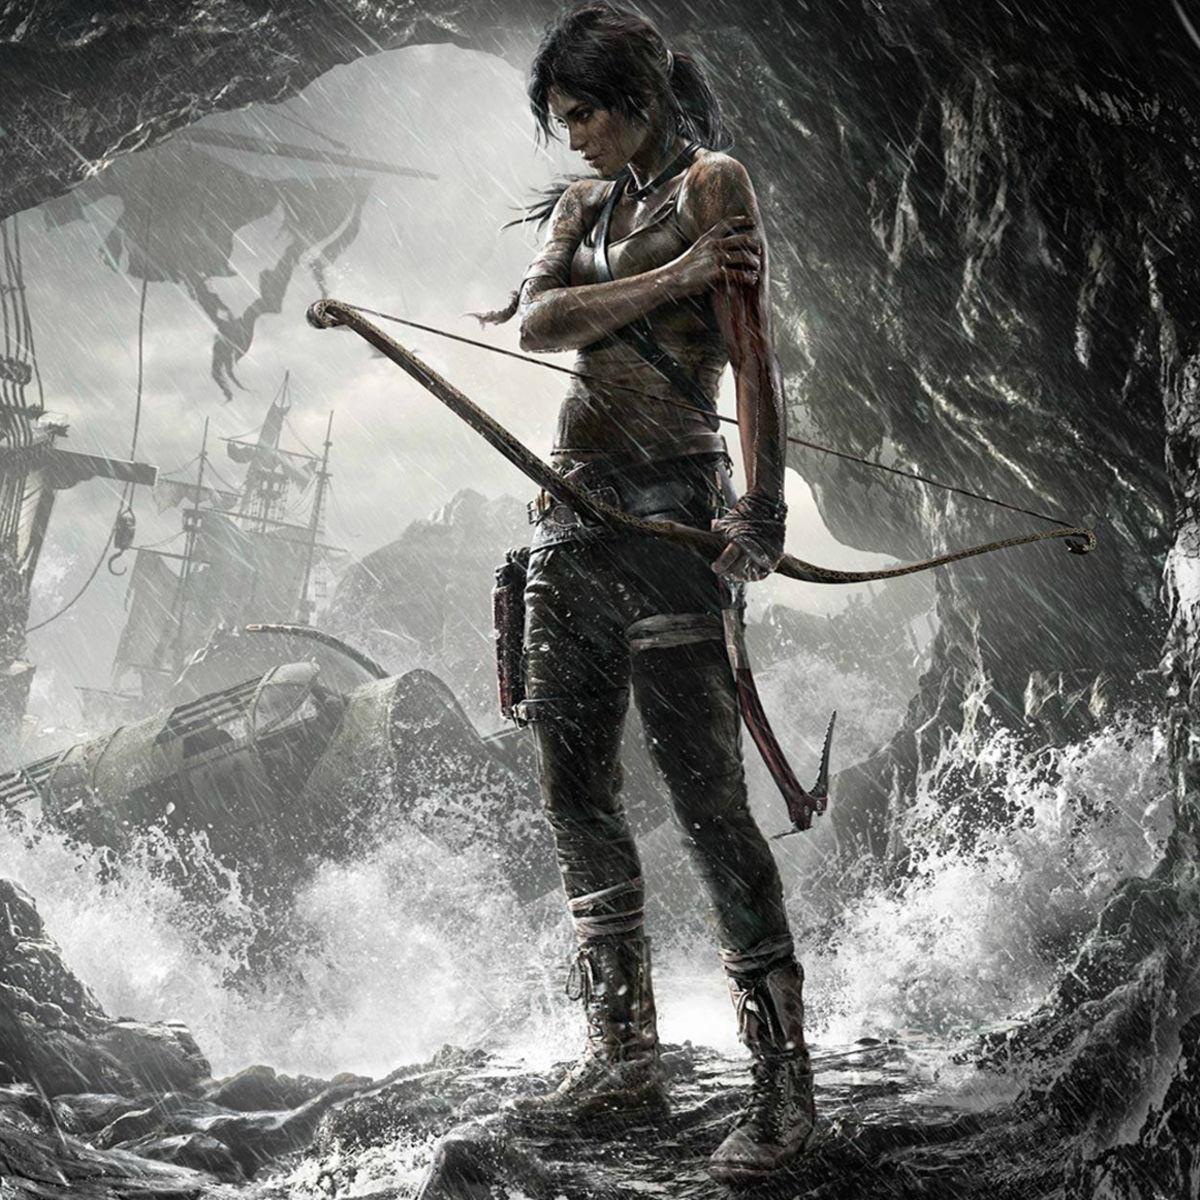 Tomb-Raider-2013-video-game-image.jpg